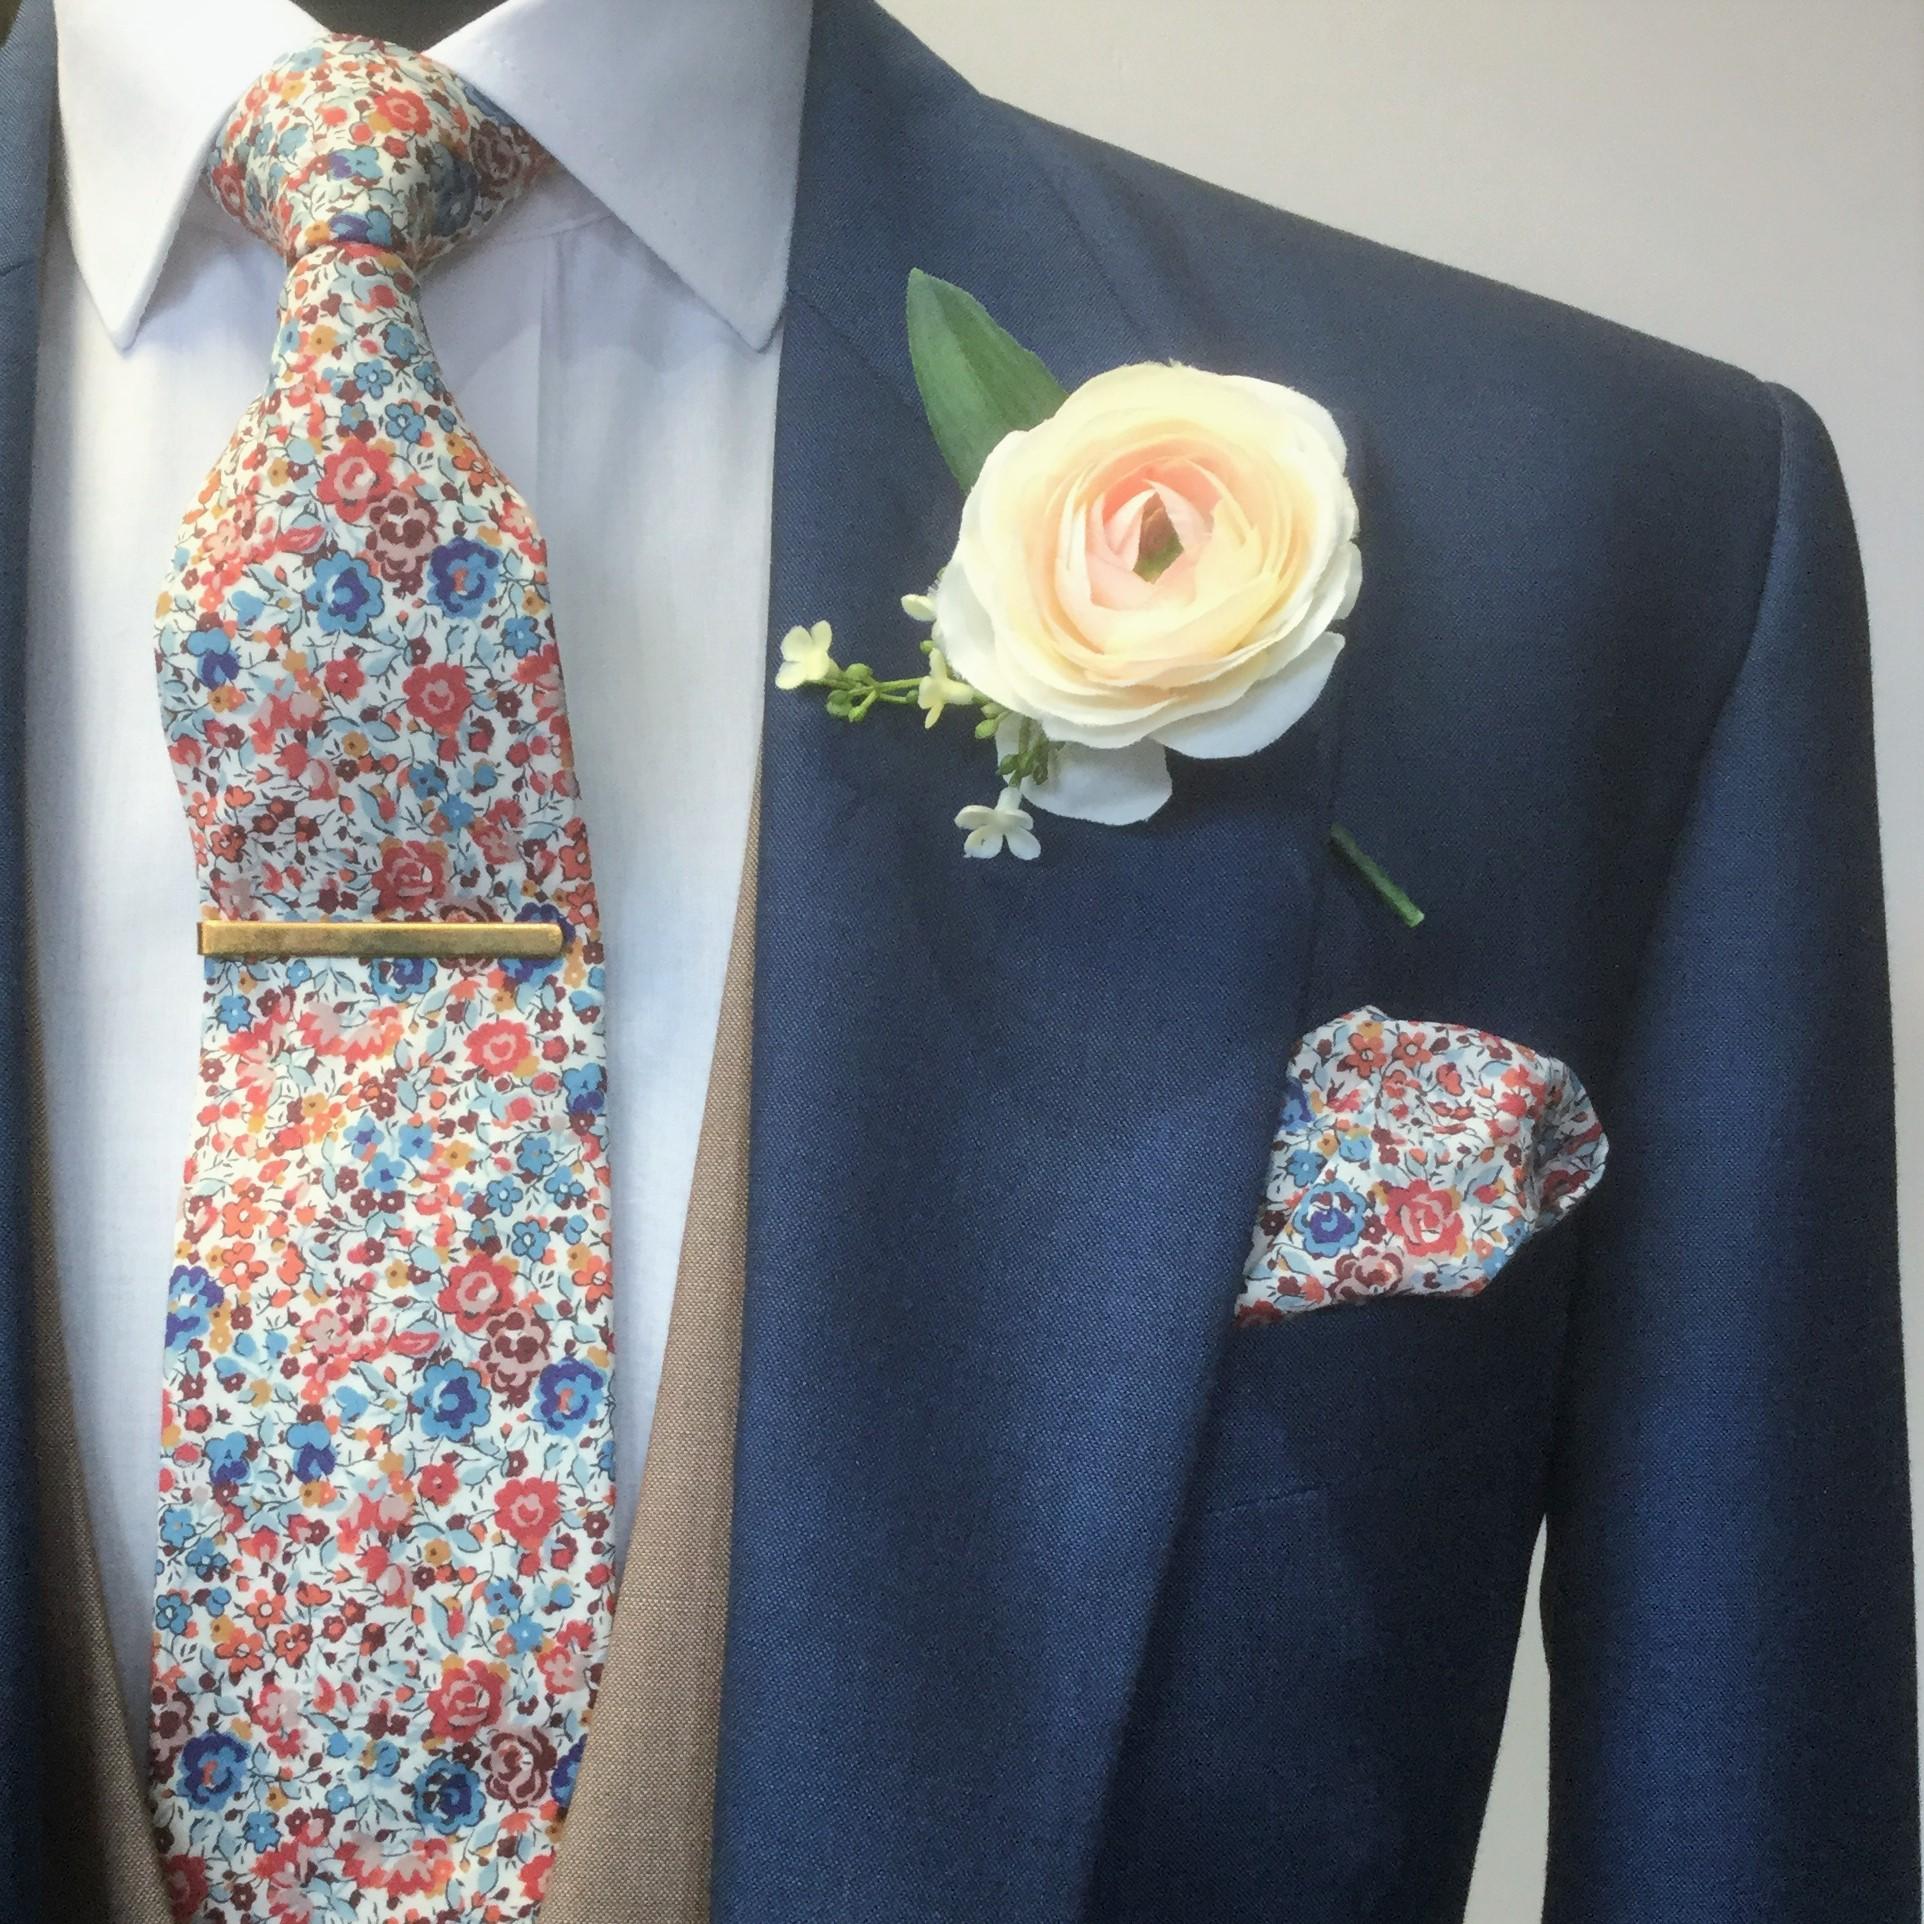 Emma & Georgina Liberty Fabric Tie & Handkerchief with Royal Blue Wedding Morning Coat